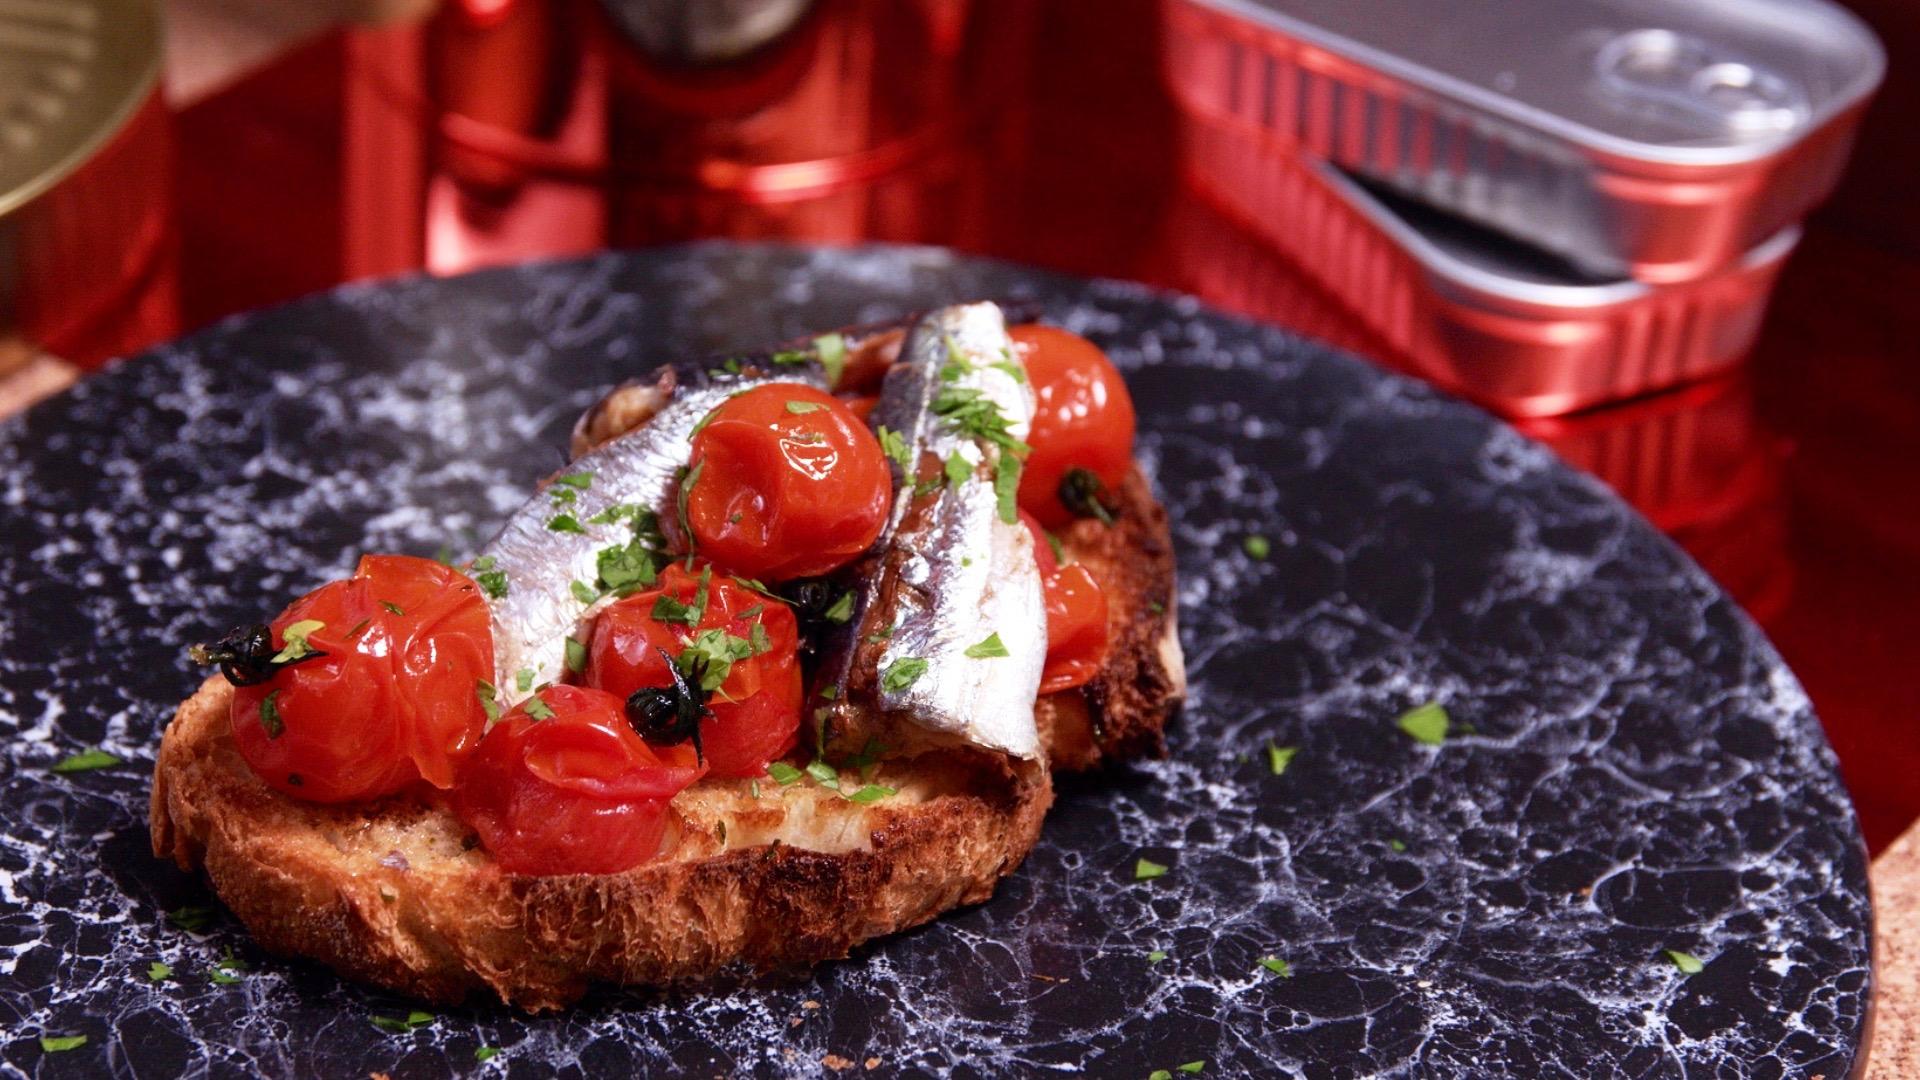 Increíble País Brewster Cocina De Un Restaurante Colección de ...